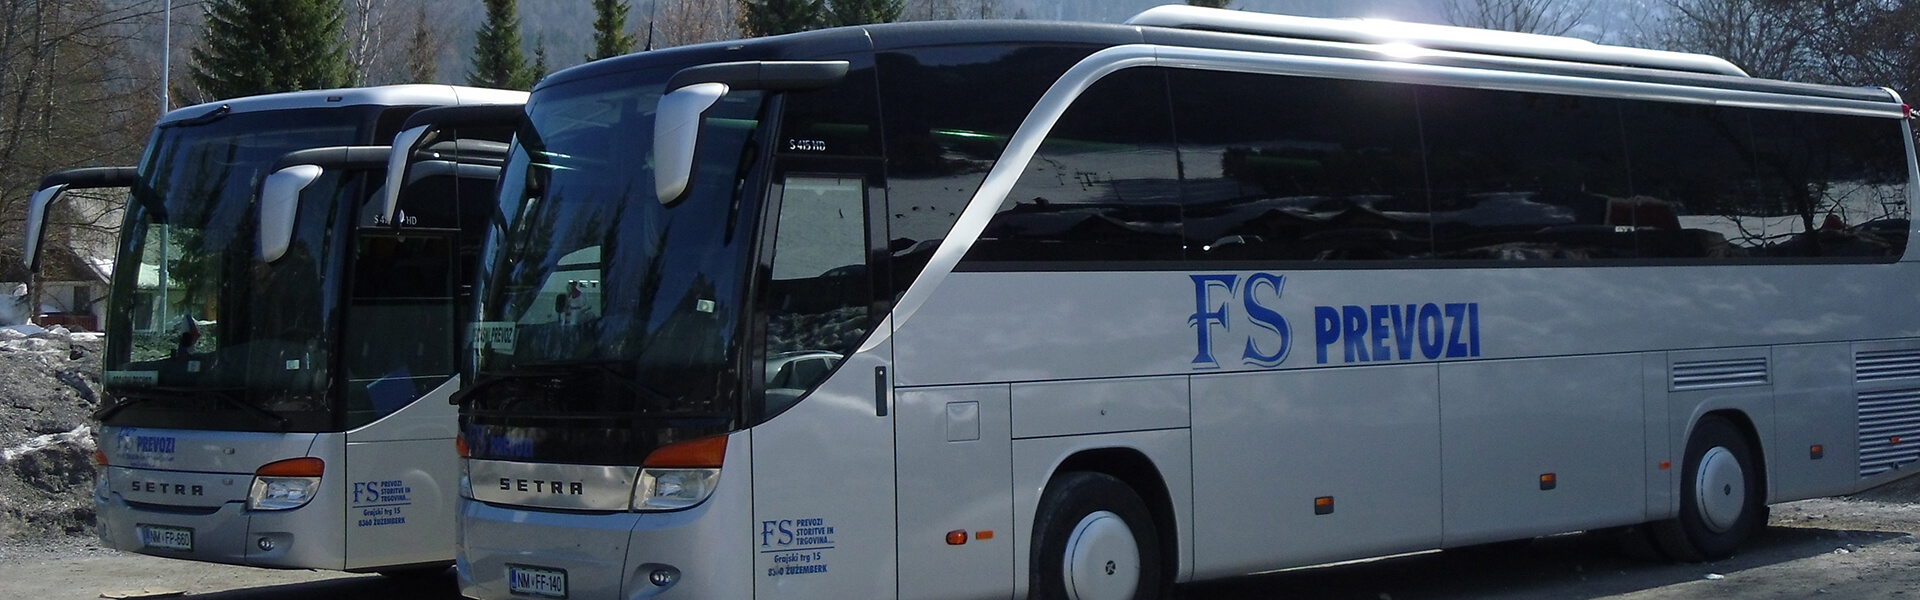 fs_prevozi_izleti